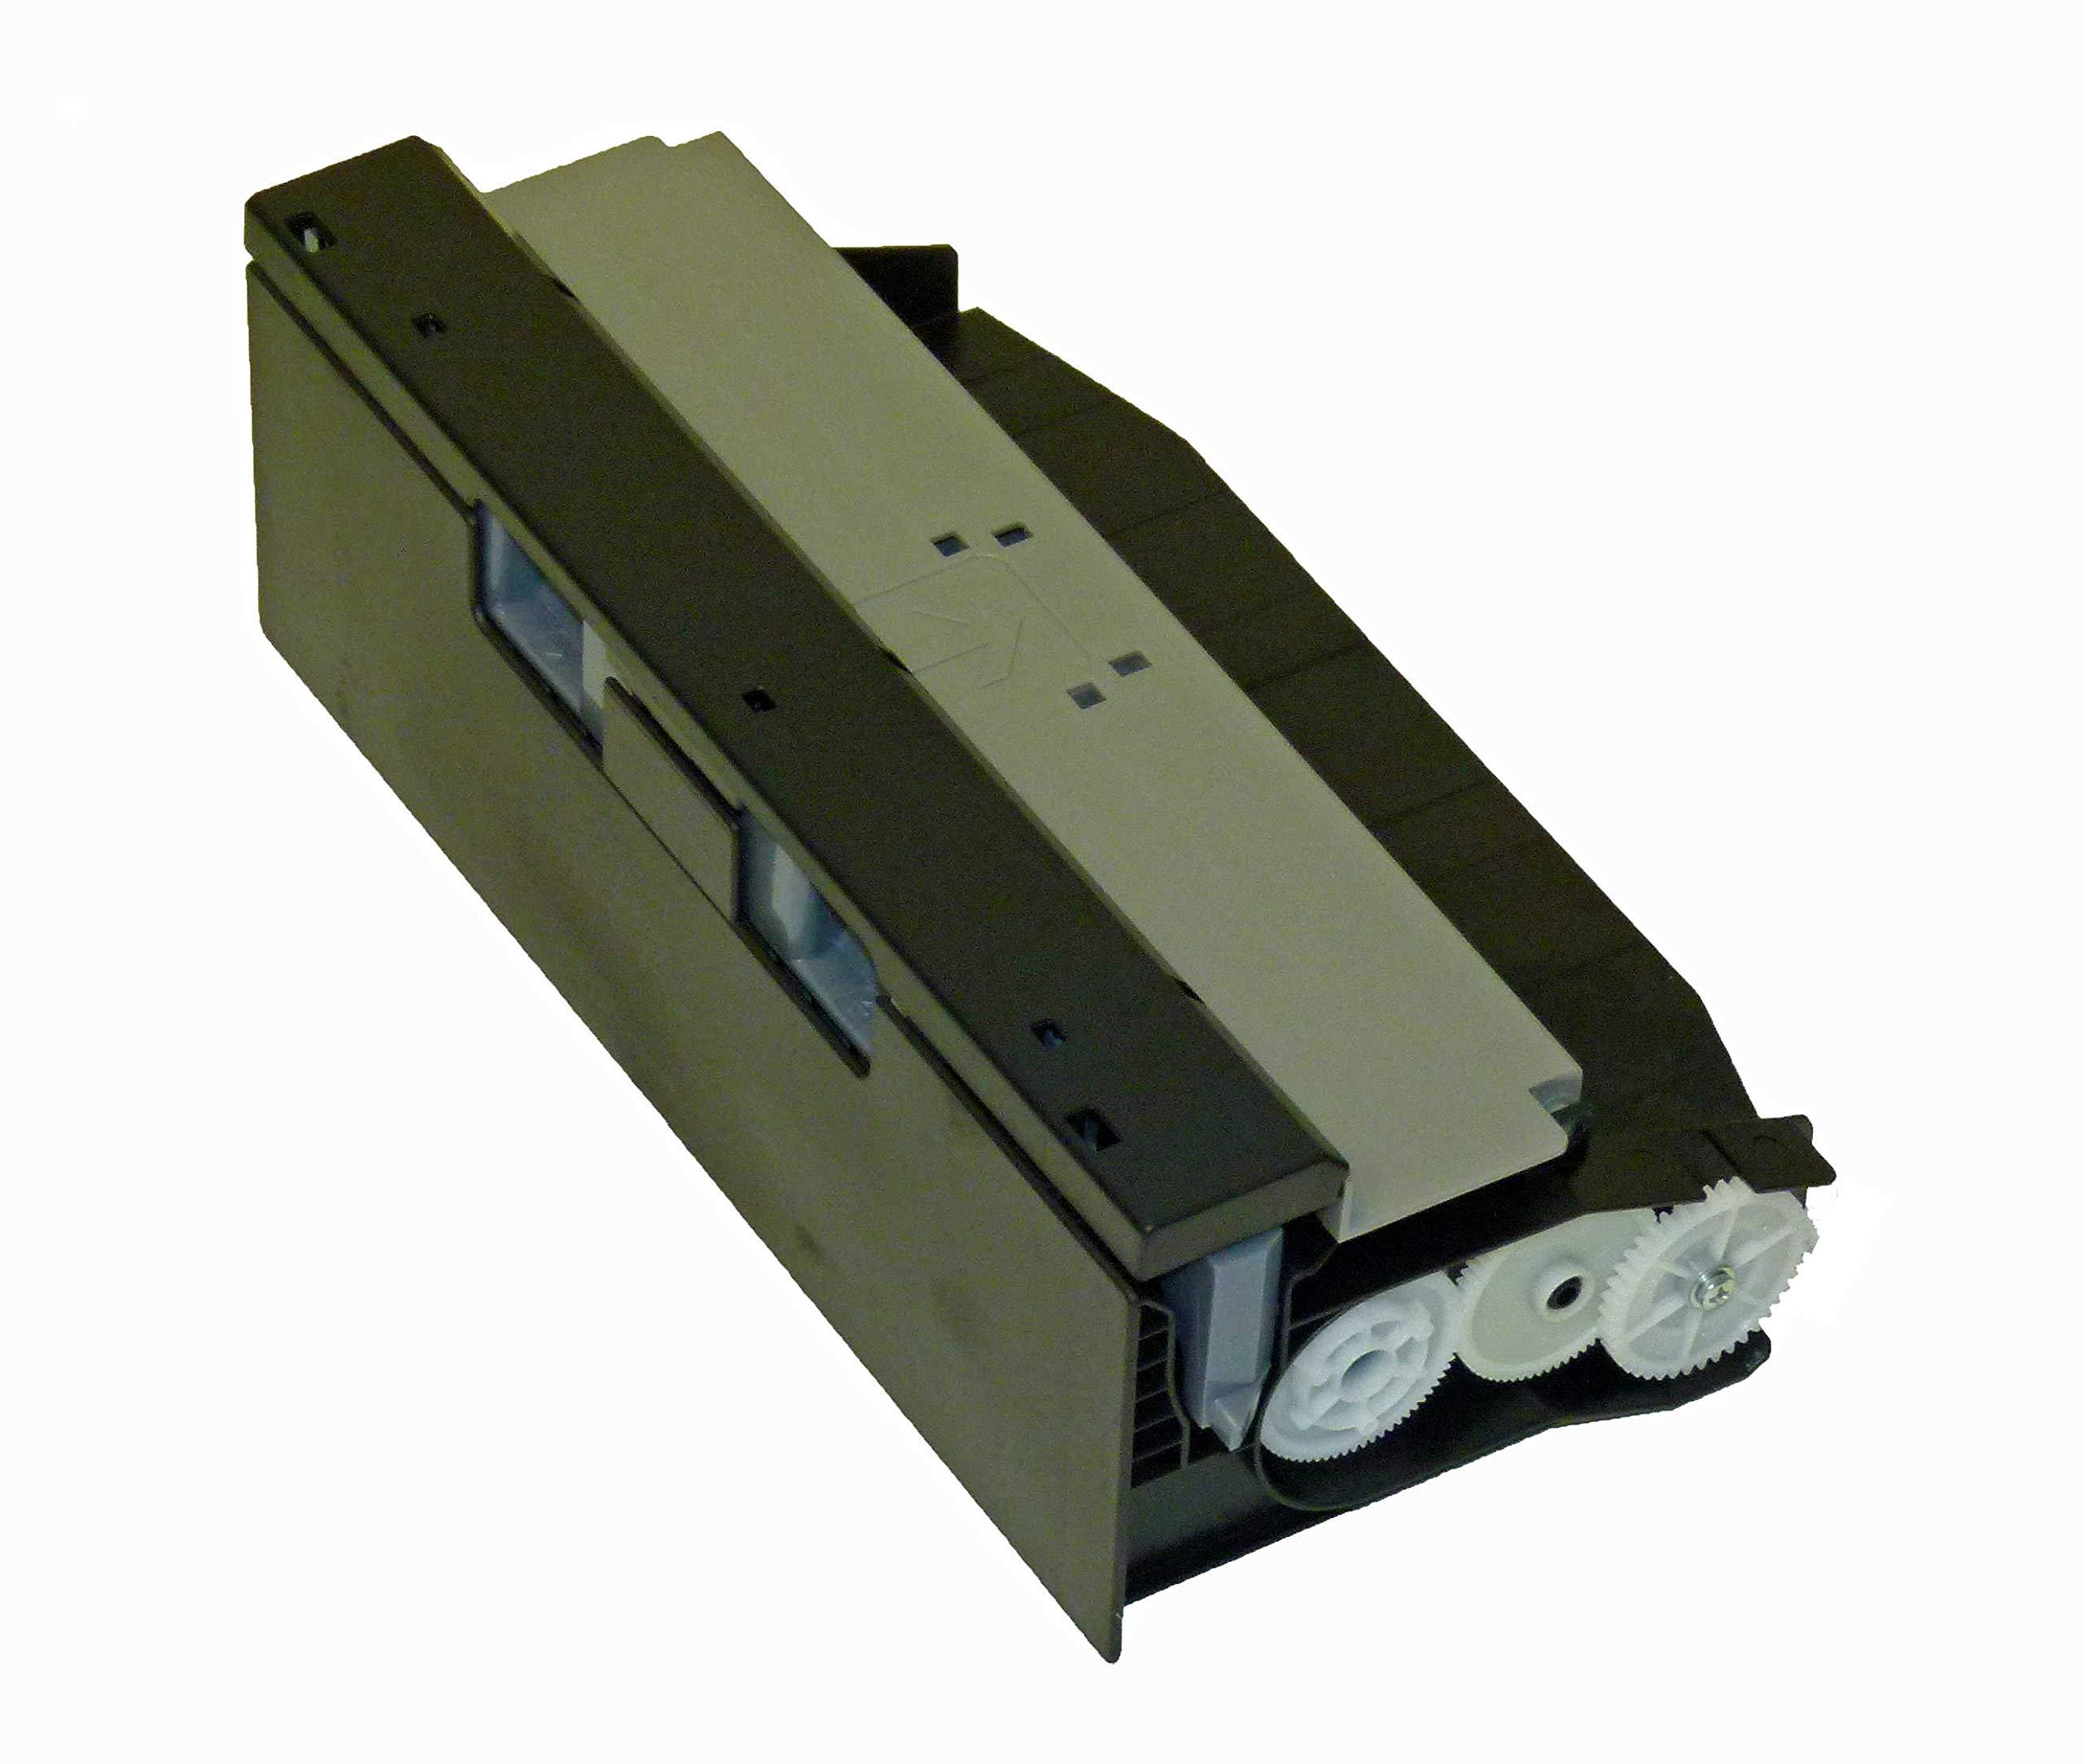 OEM Epson Duplex/Duplexer Assembly Shipped with ECOTANK ET-3600, ET-4550, Workforce WF-2750, WF-2751, WF-2760